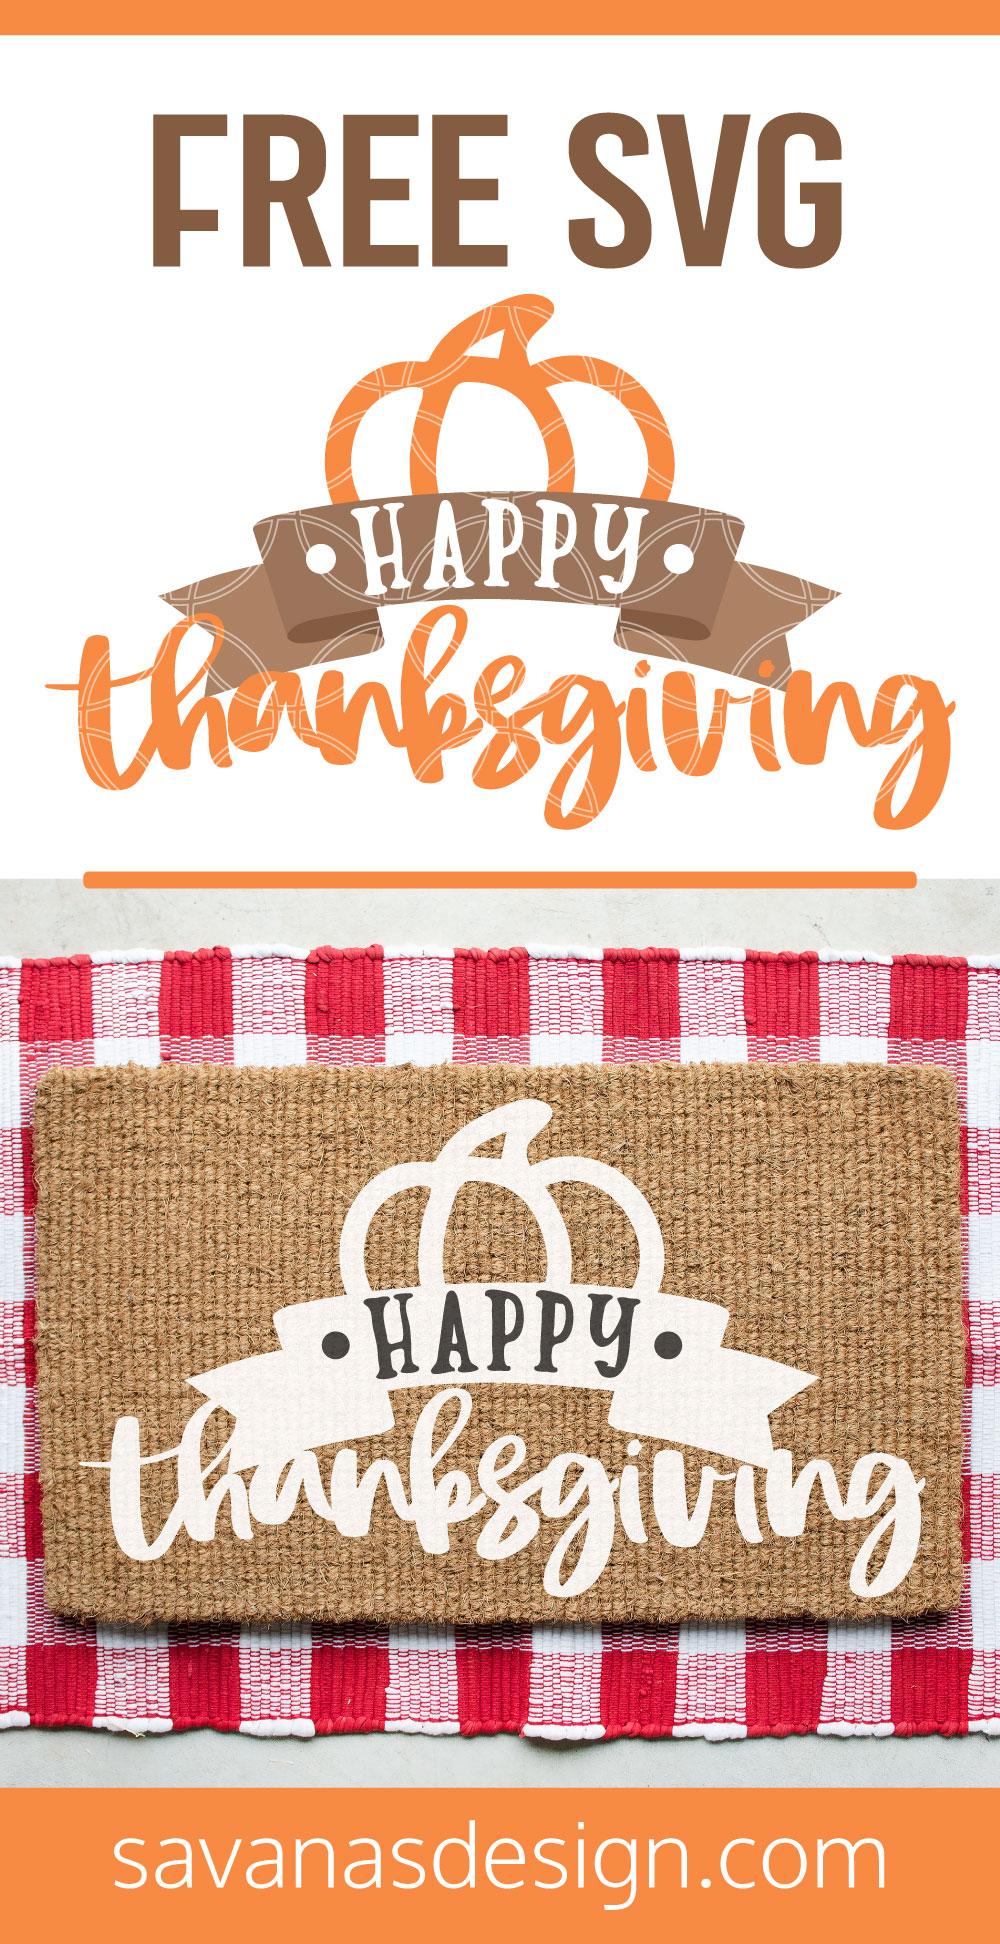 Happy Thanksgiving SVG Pinterest